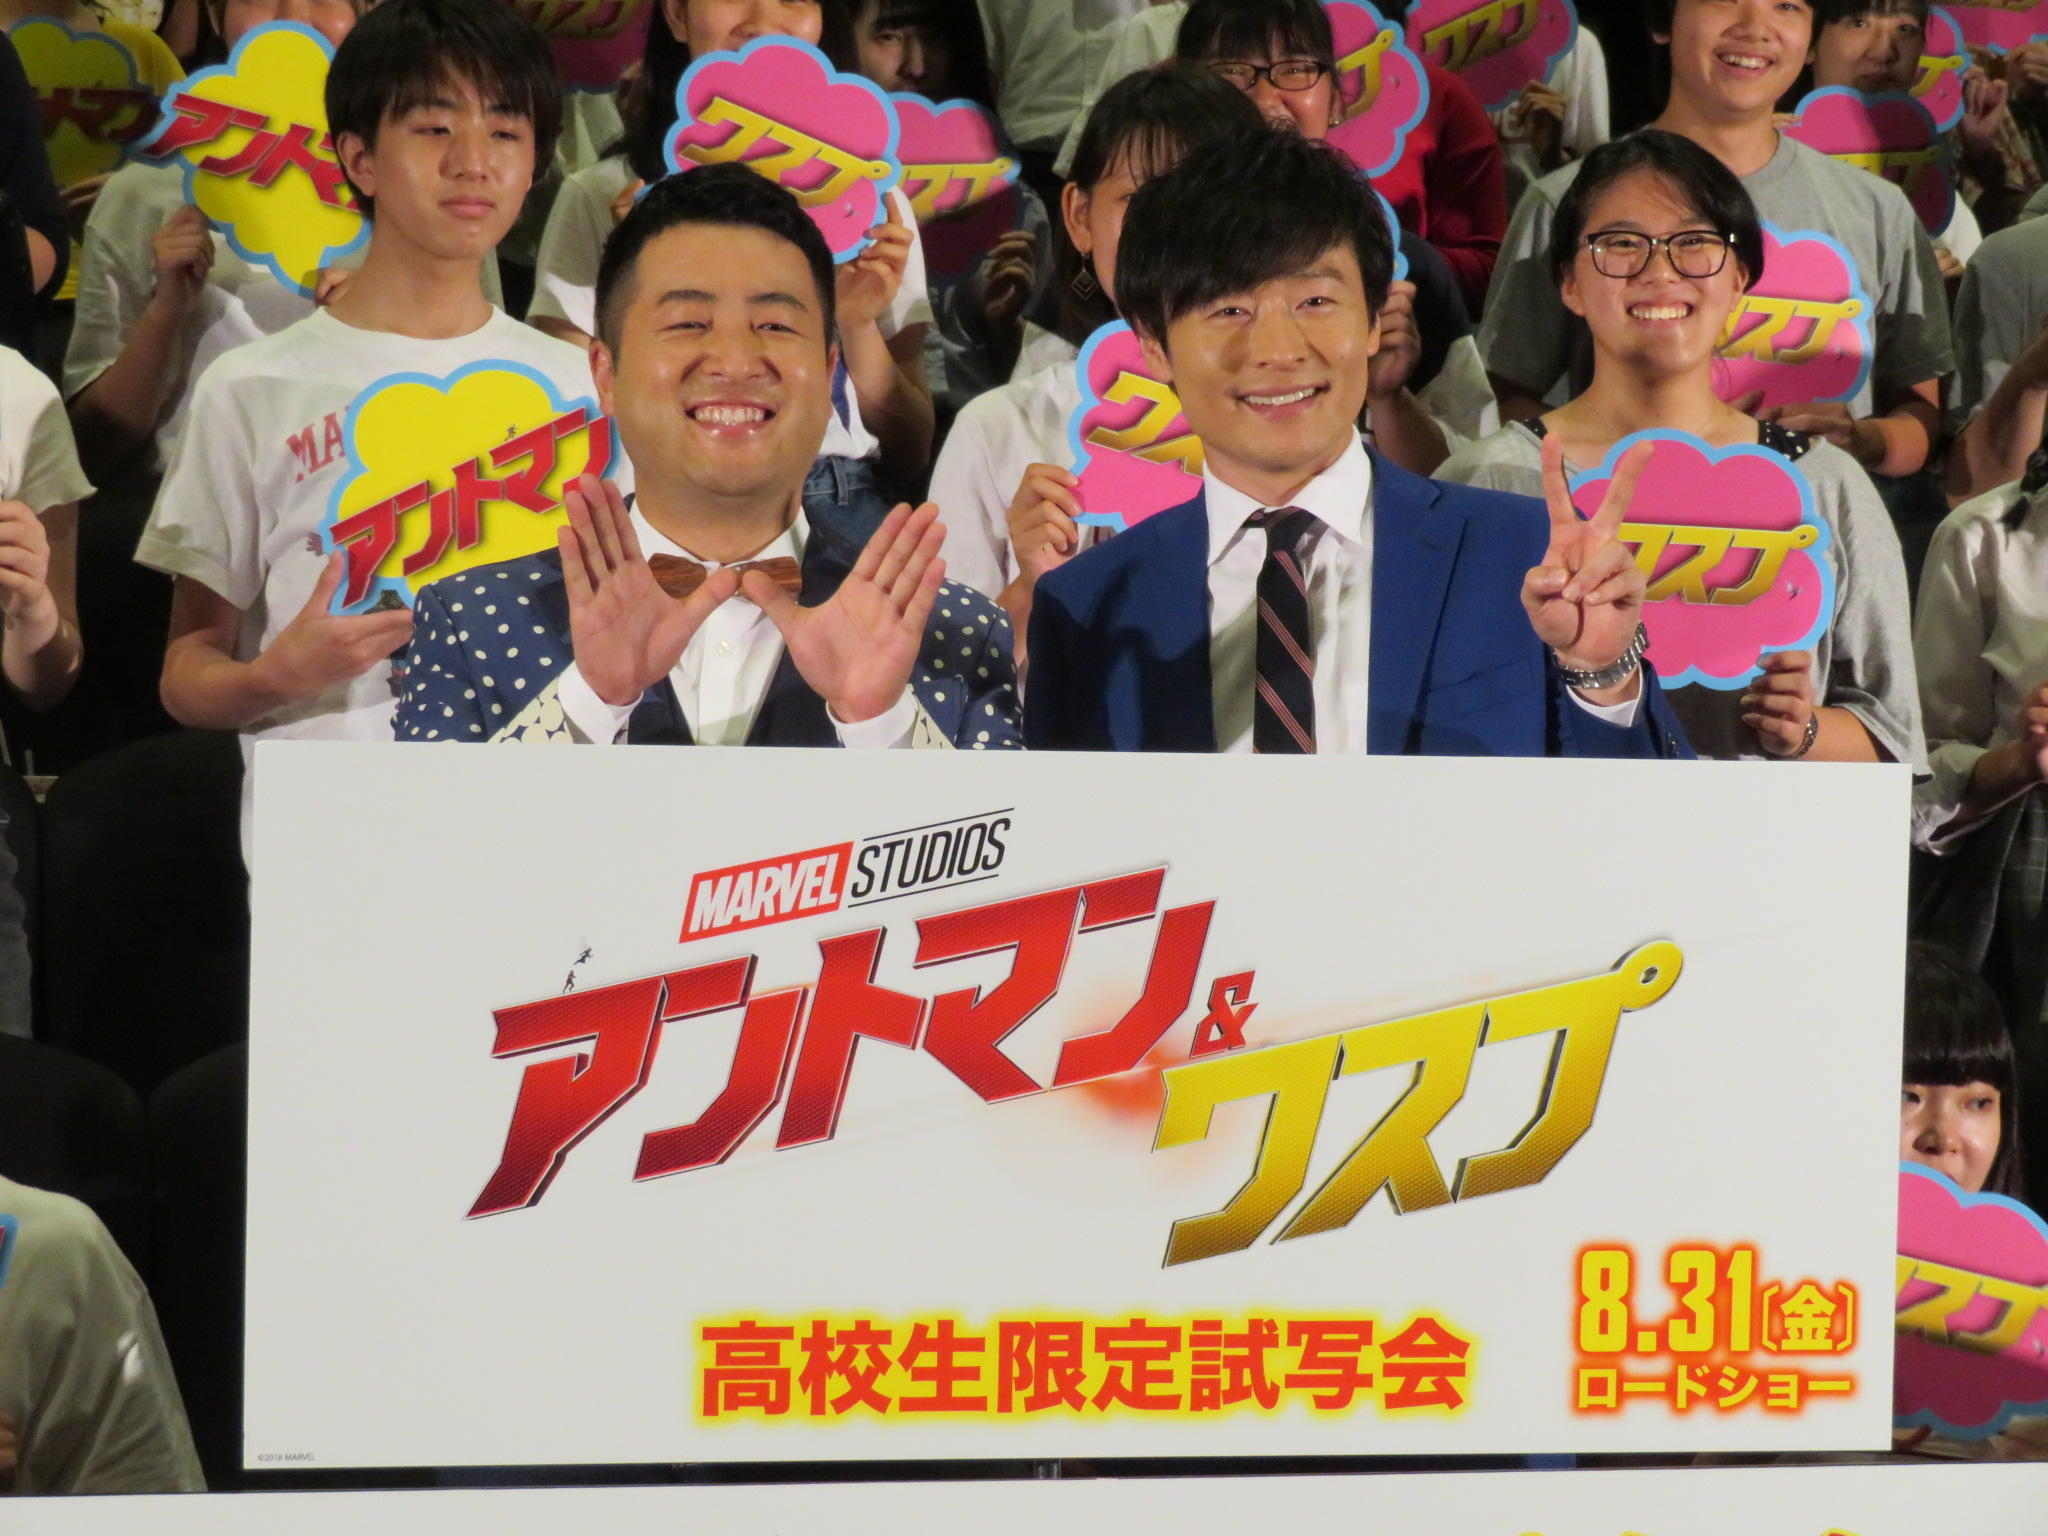 http://news.yoshimoto.co.jp/20180810020738-63265dc7cf7cba206194dde6aa7ae121b714b2d6.jpg